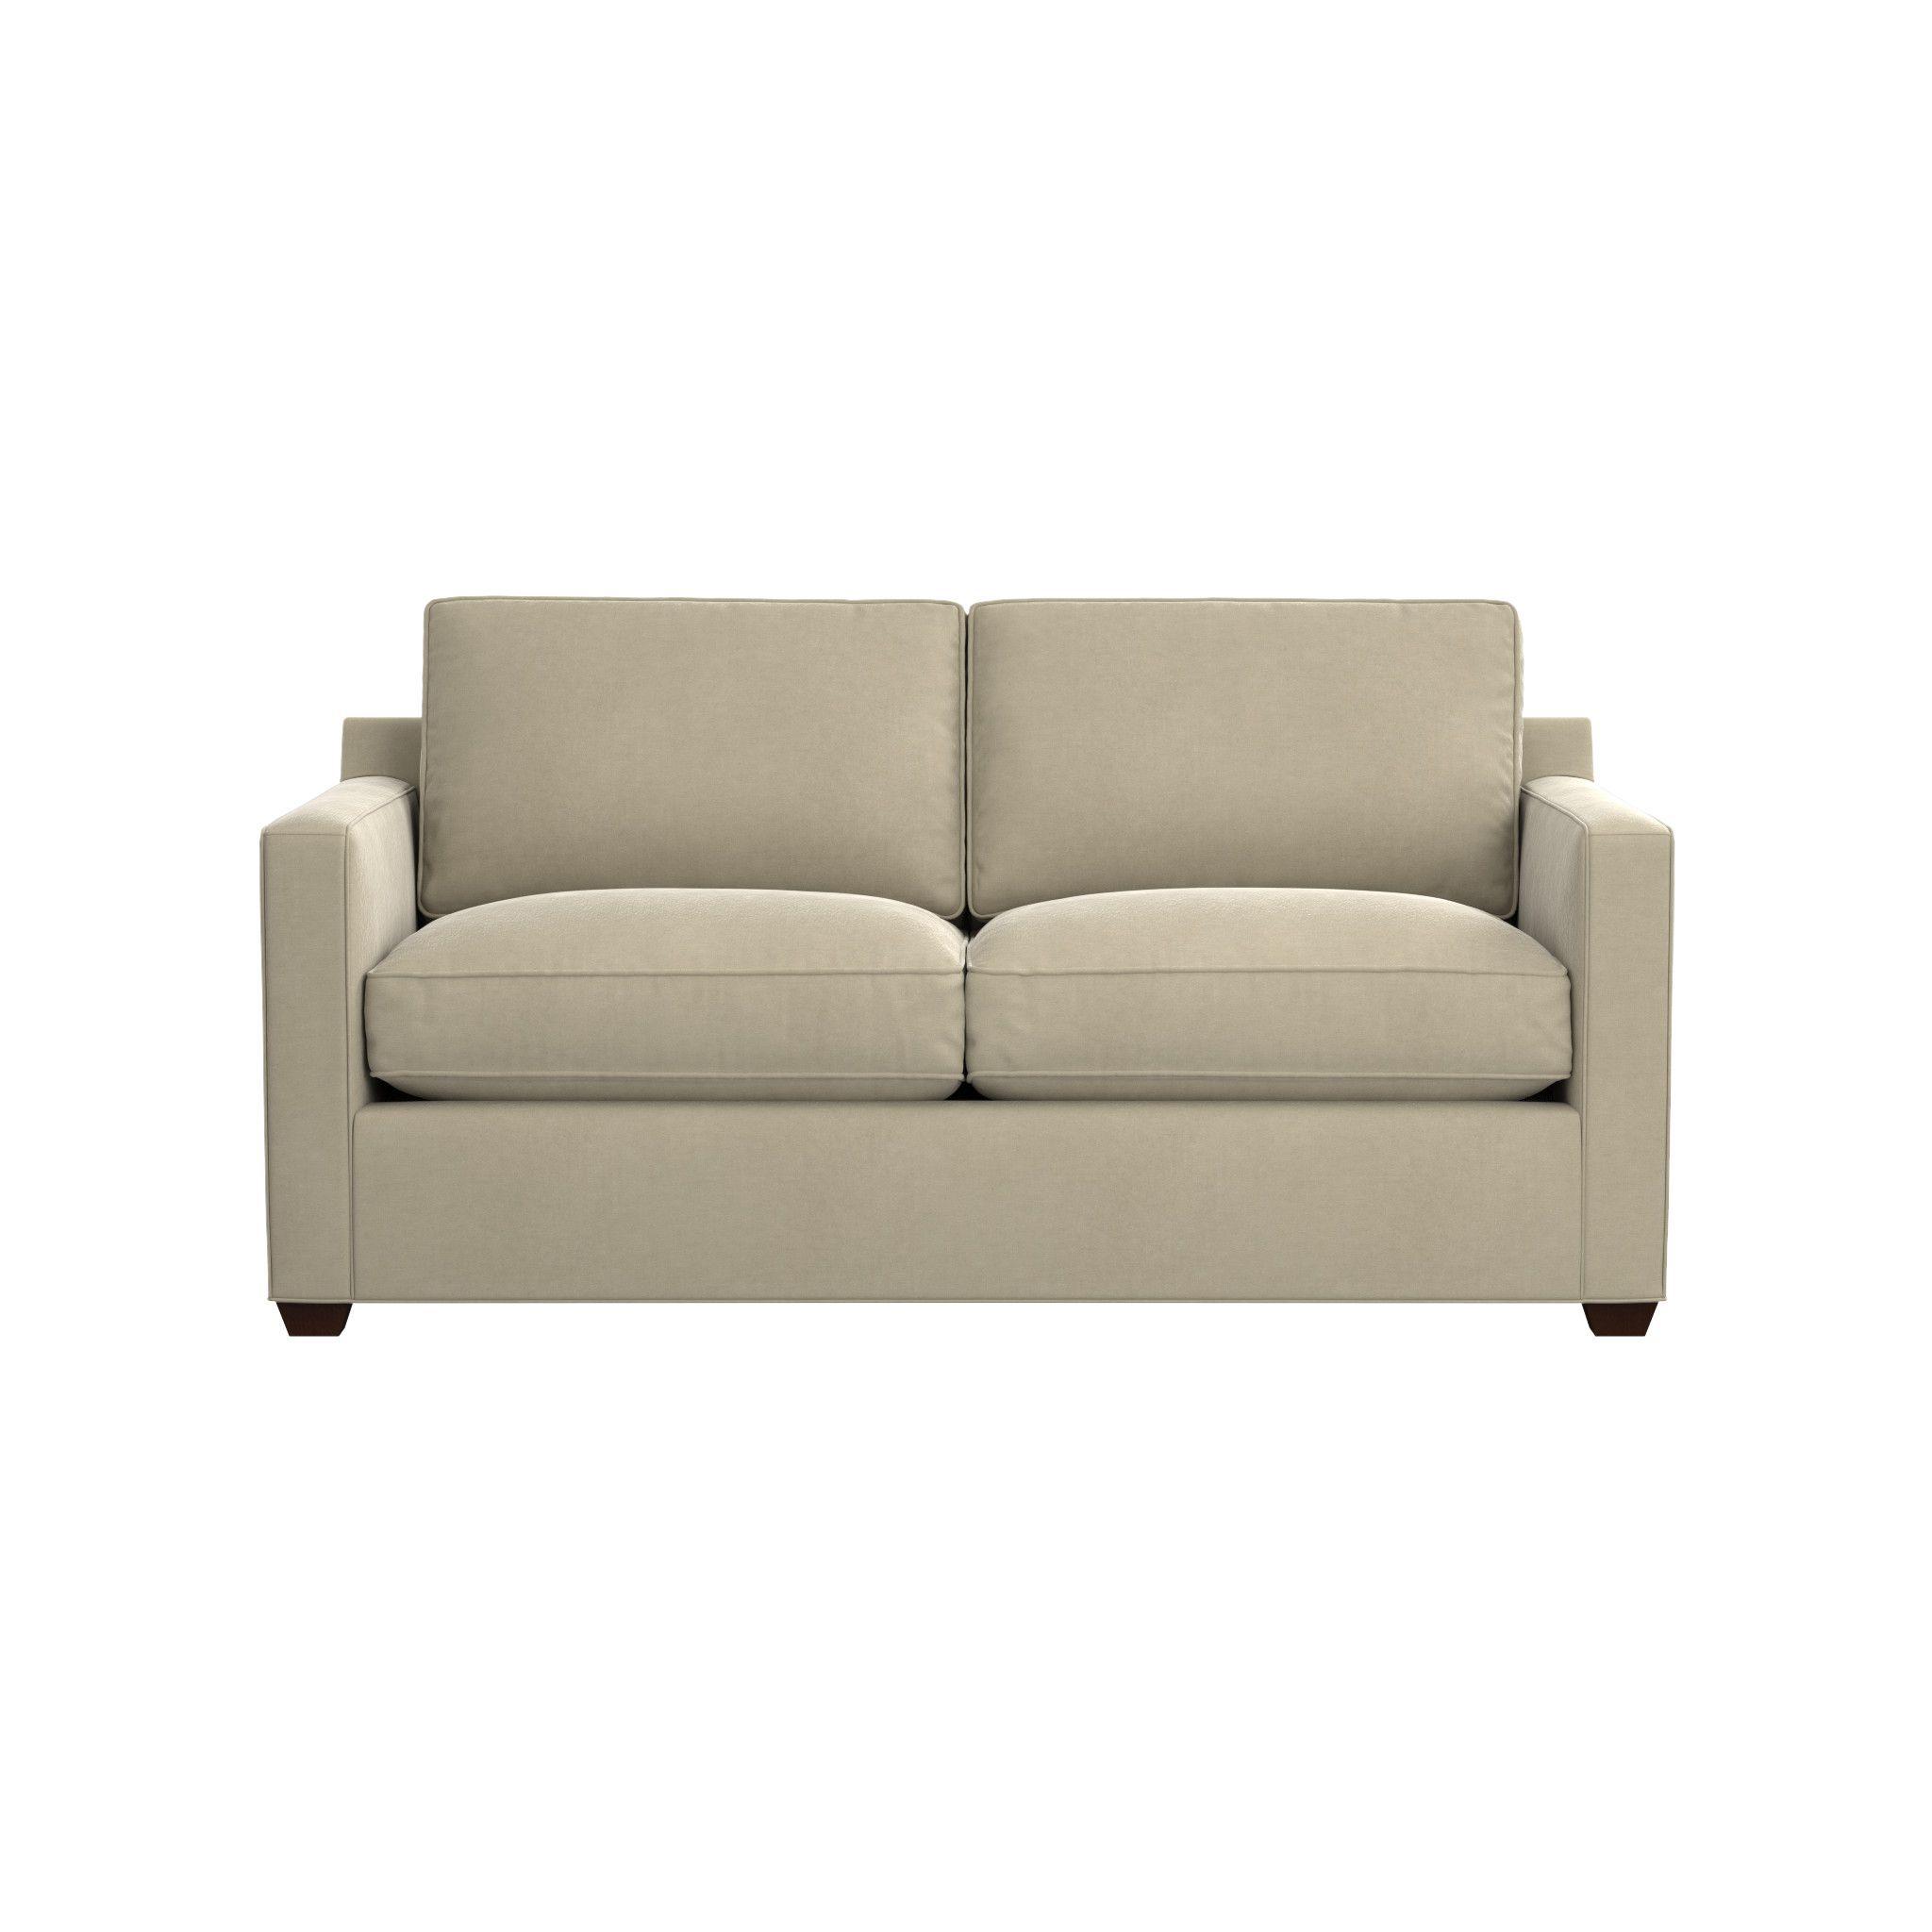 Shop Davis Full Sleeper Sofa with Air Mattress. Topped